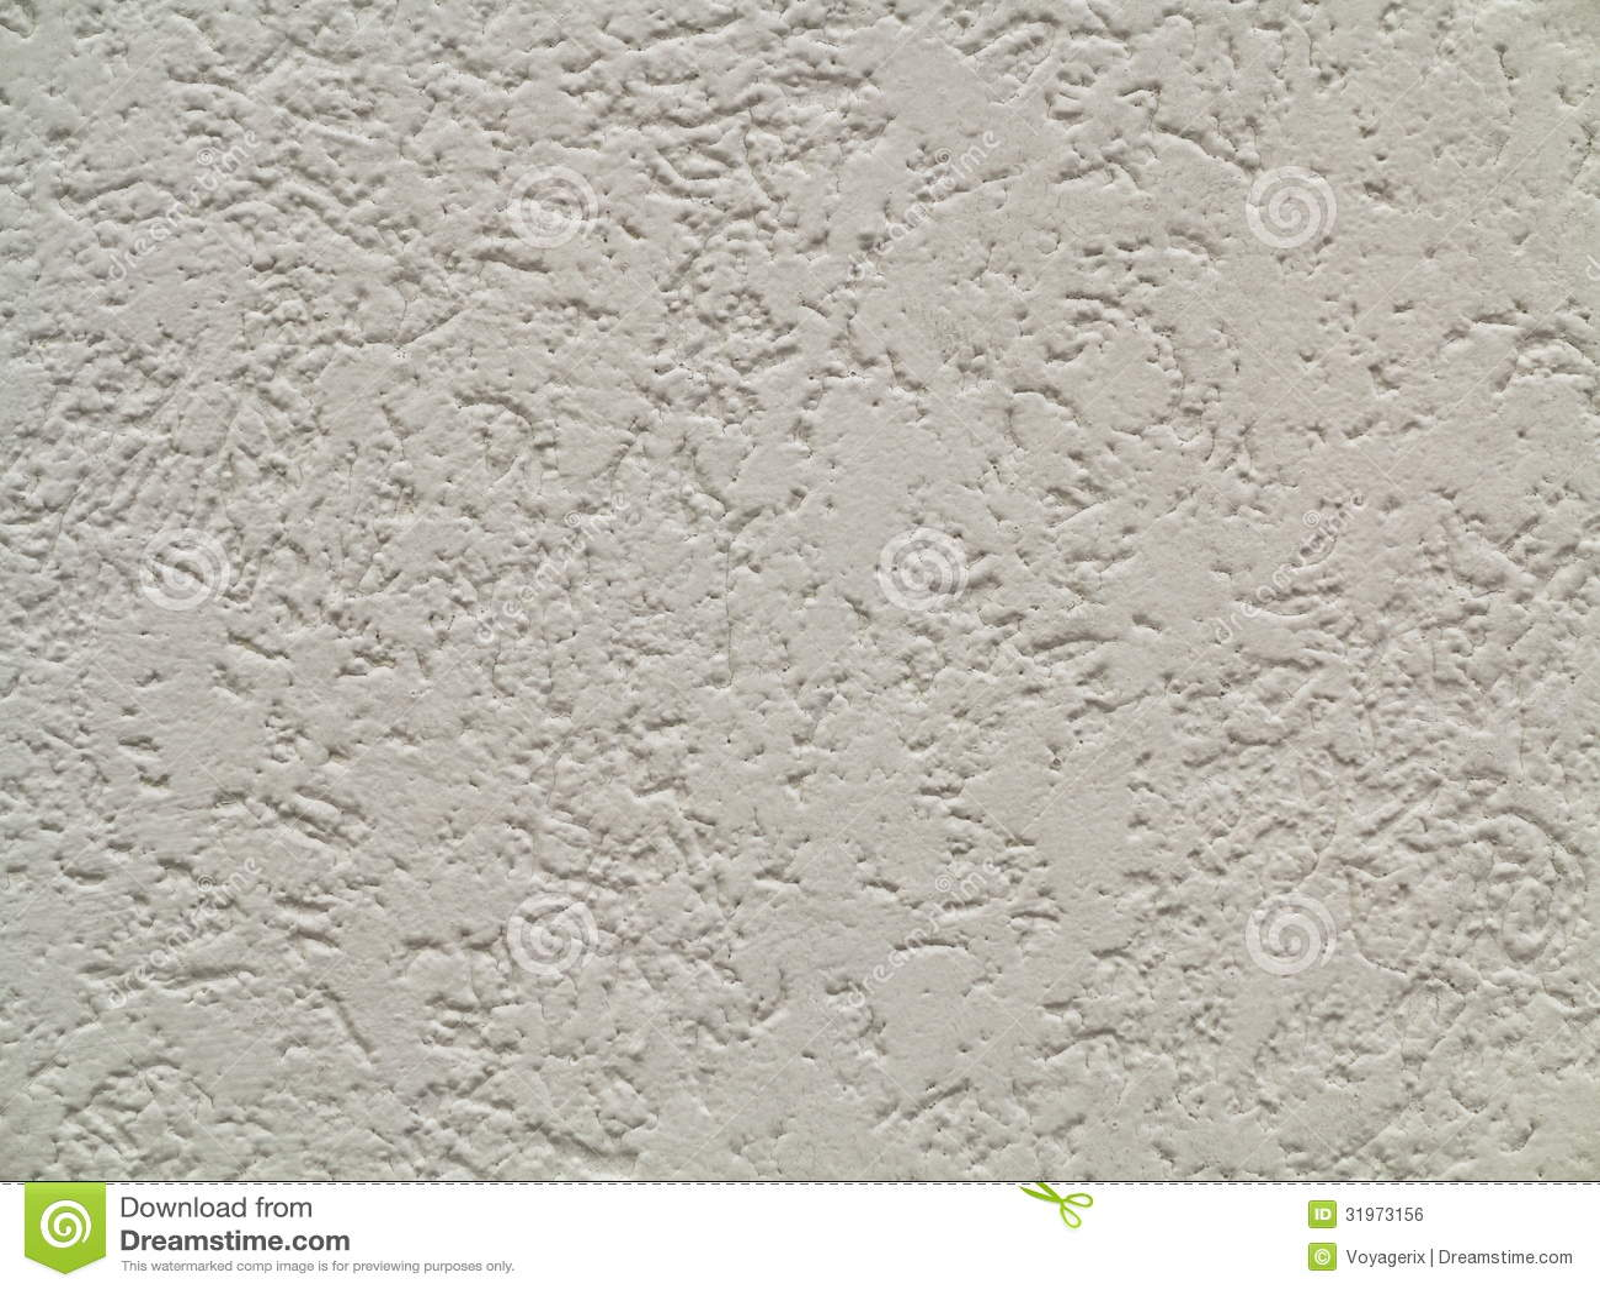 Fondo o textura gris de la pared de la pintura foto de - Pintura gris pared ...